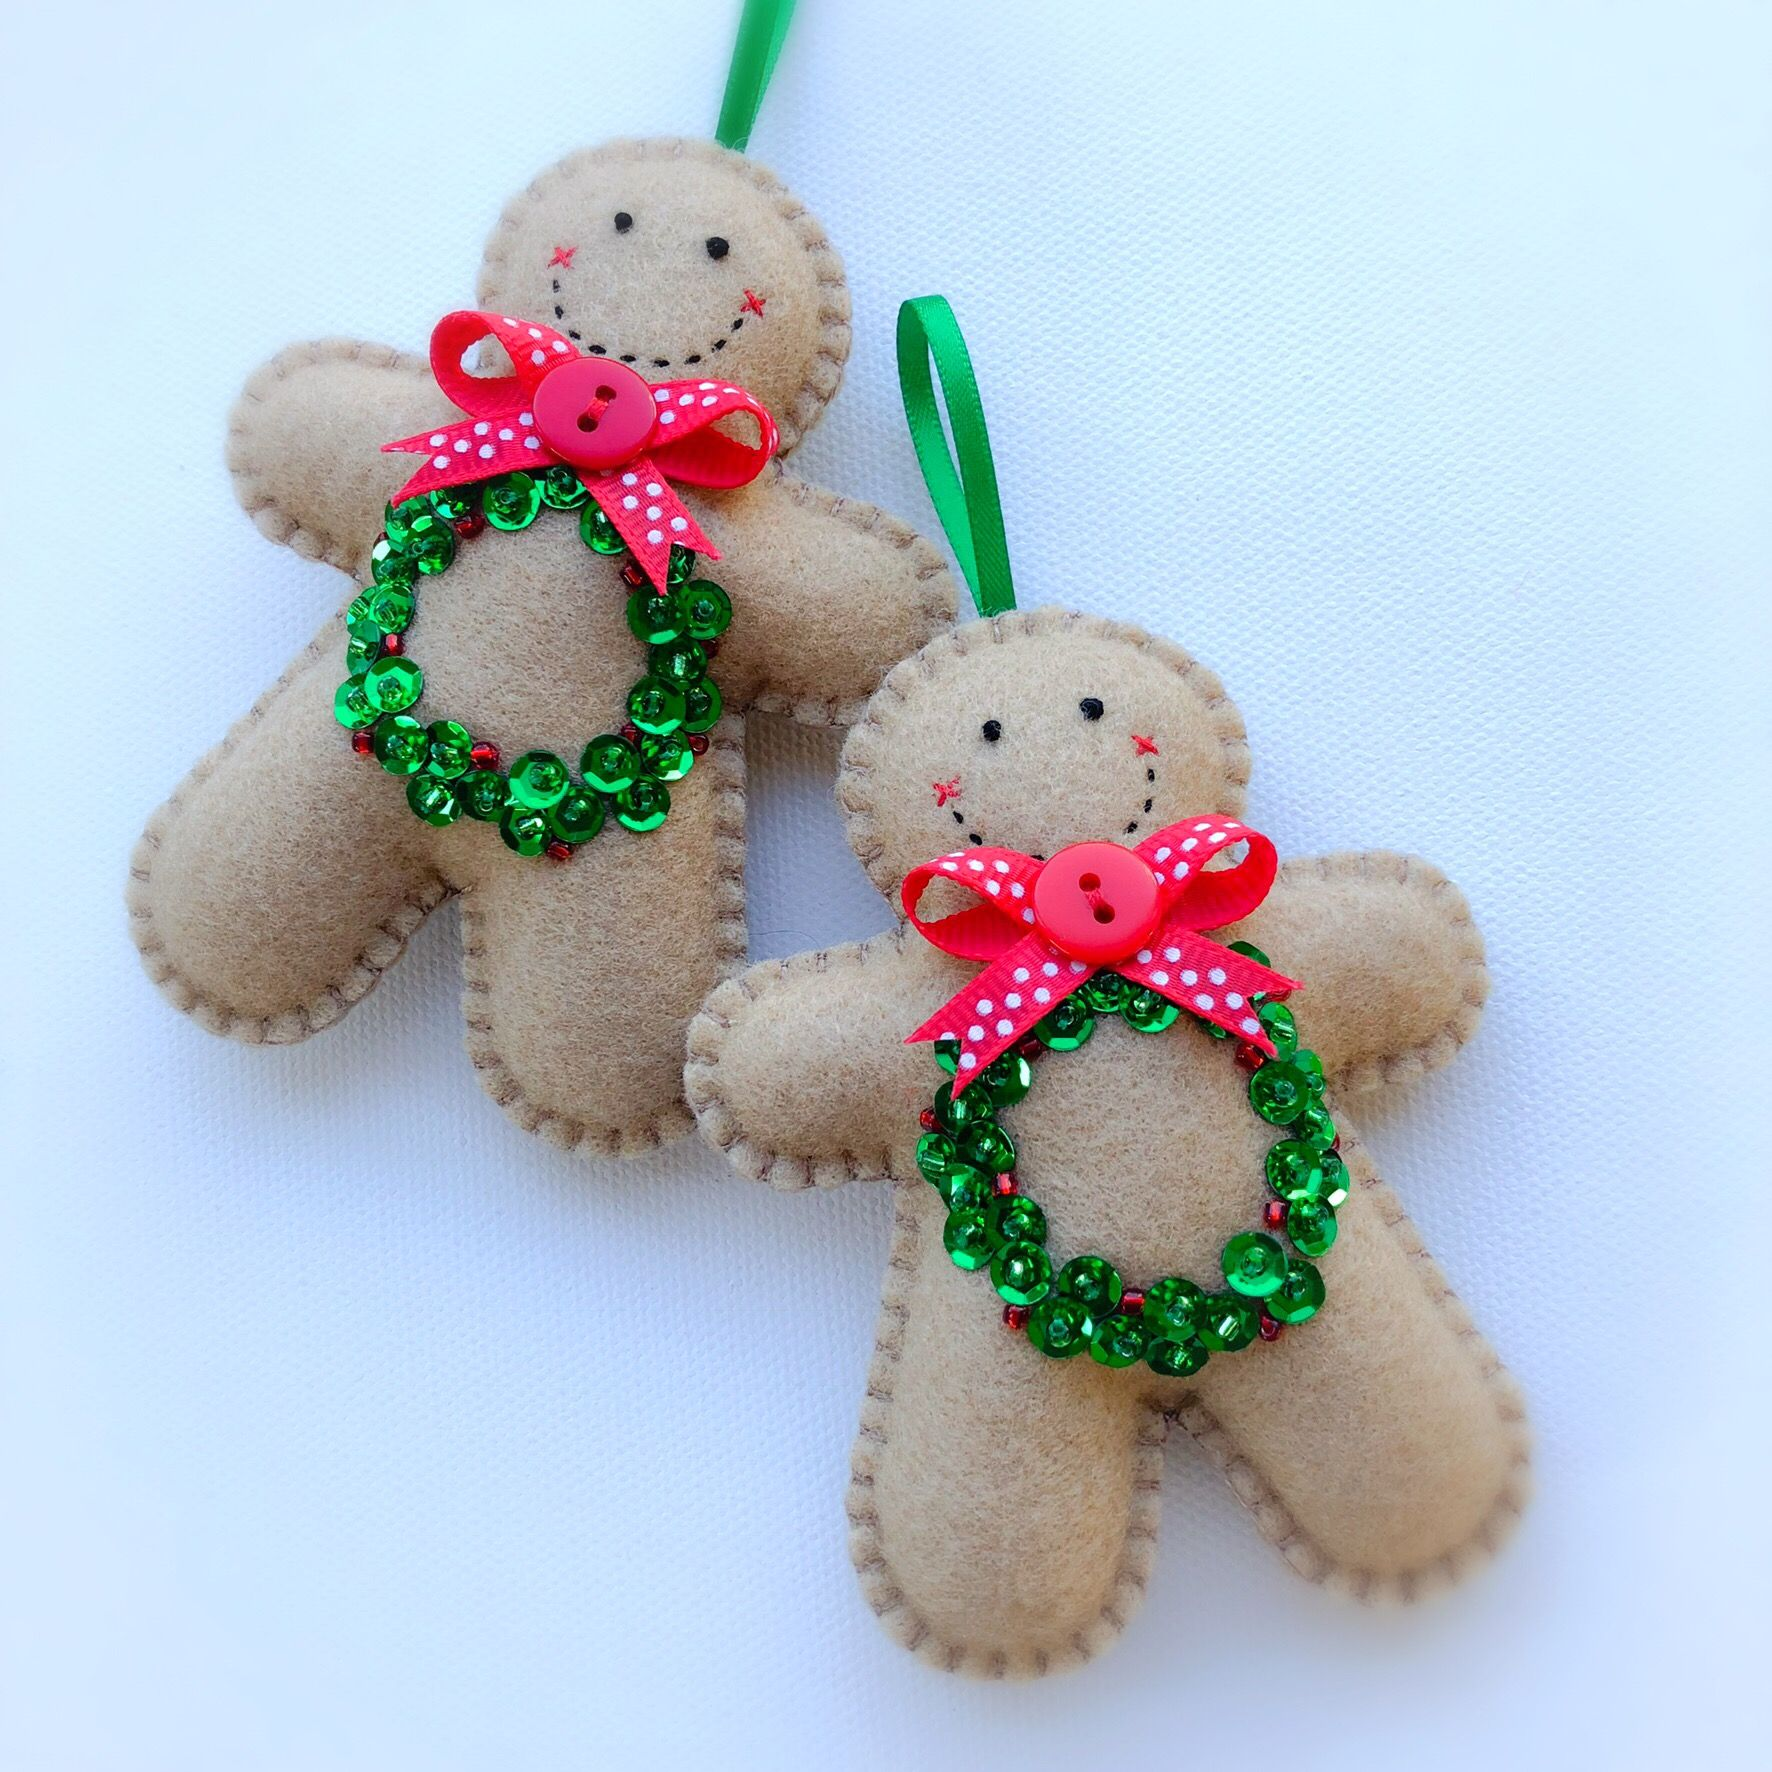 Hand stitched Felt Gingerbread Men Christmas Ornaments